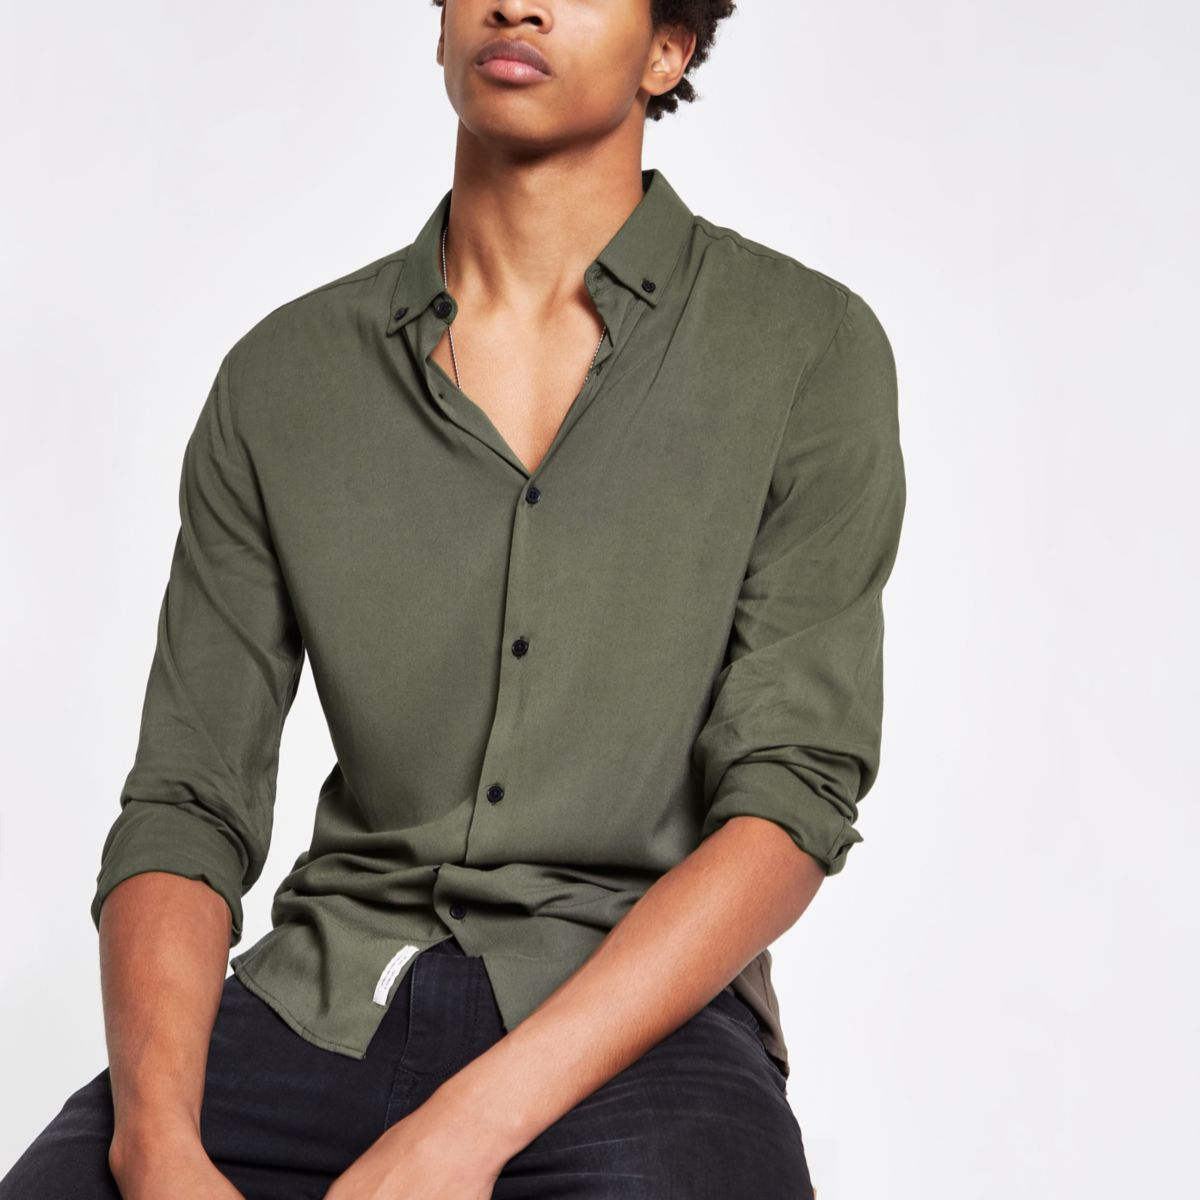 Khaki viscose long sleeve shirt